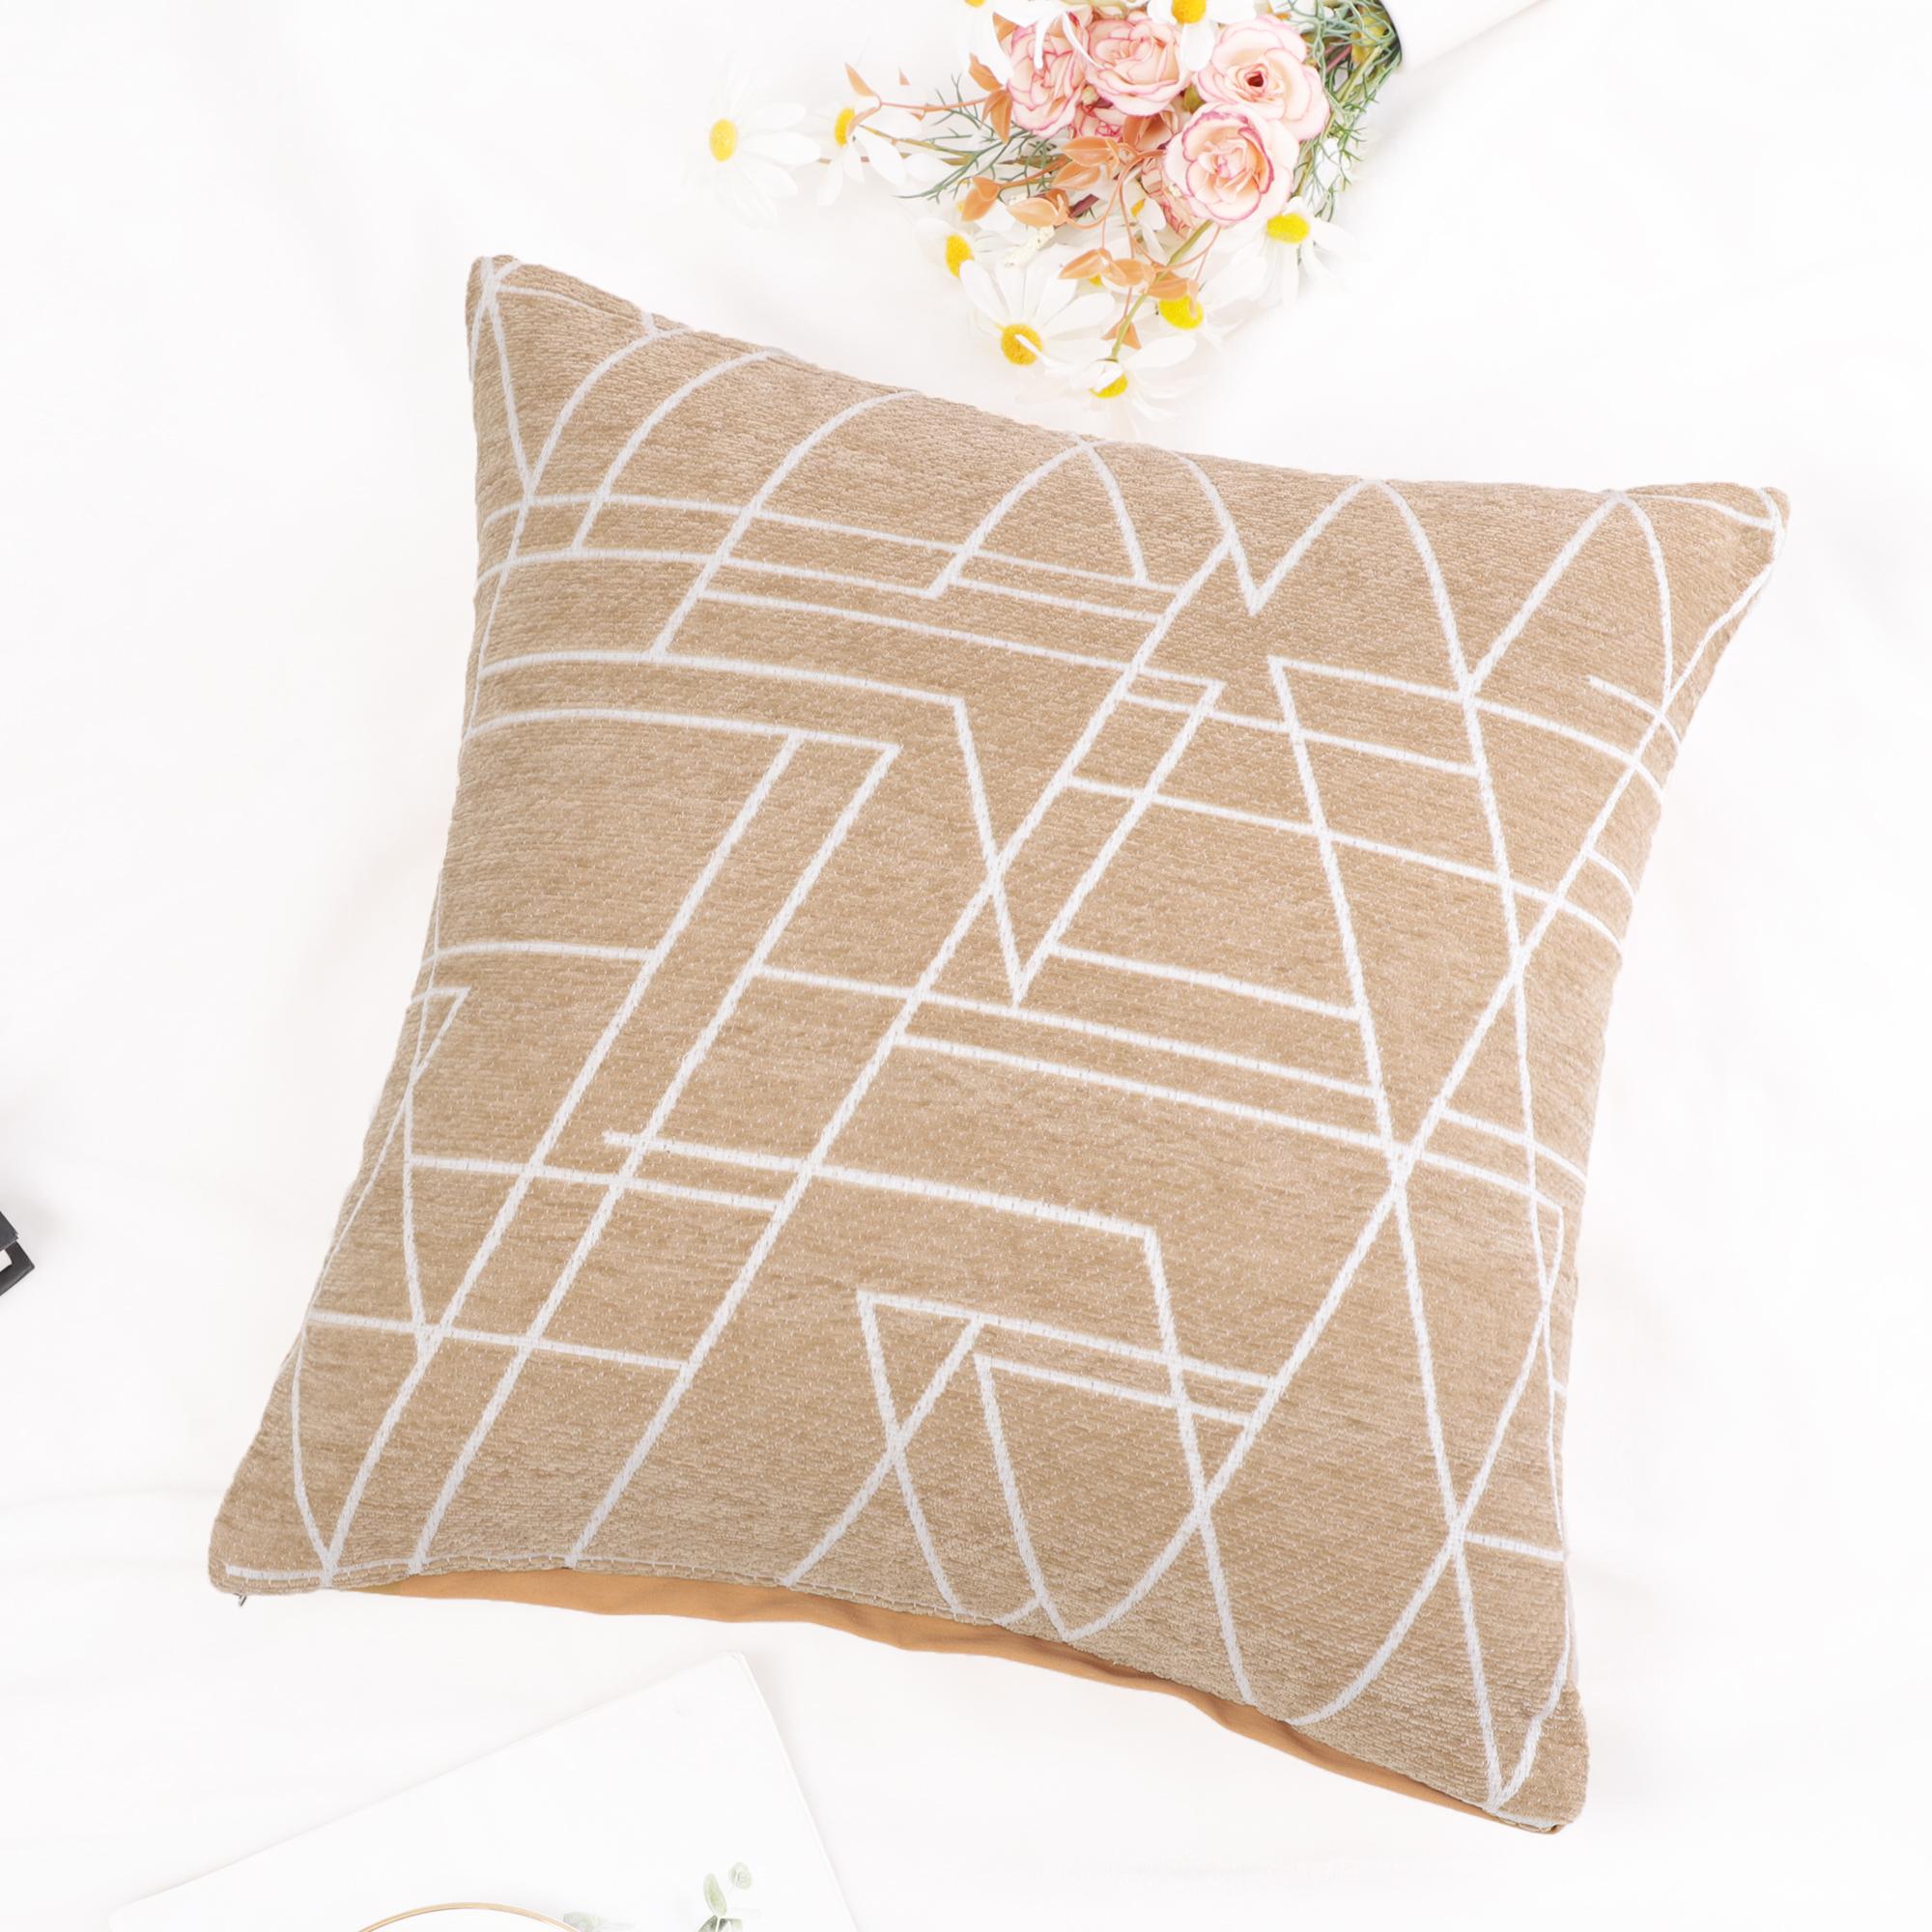 Decoration-Pillow-Covers-Cotton-Linen-Throw-Pillow-Case-Cushion-Cover thumbnail 37